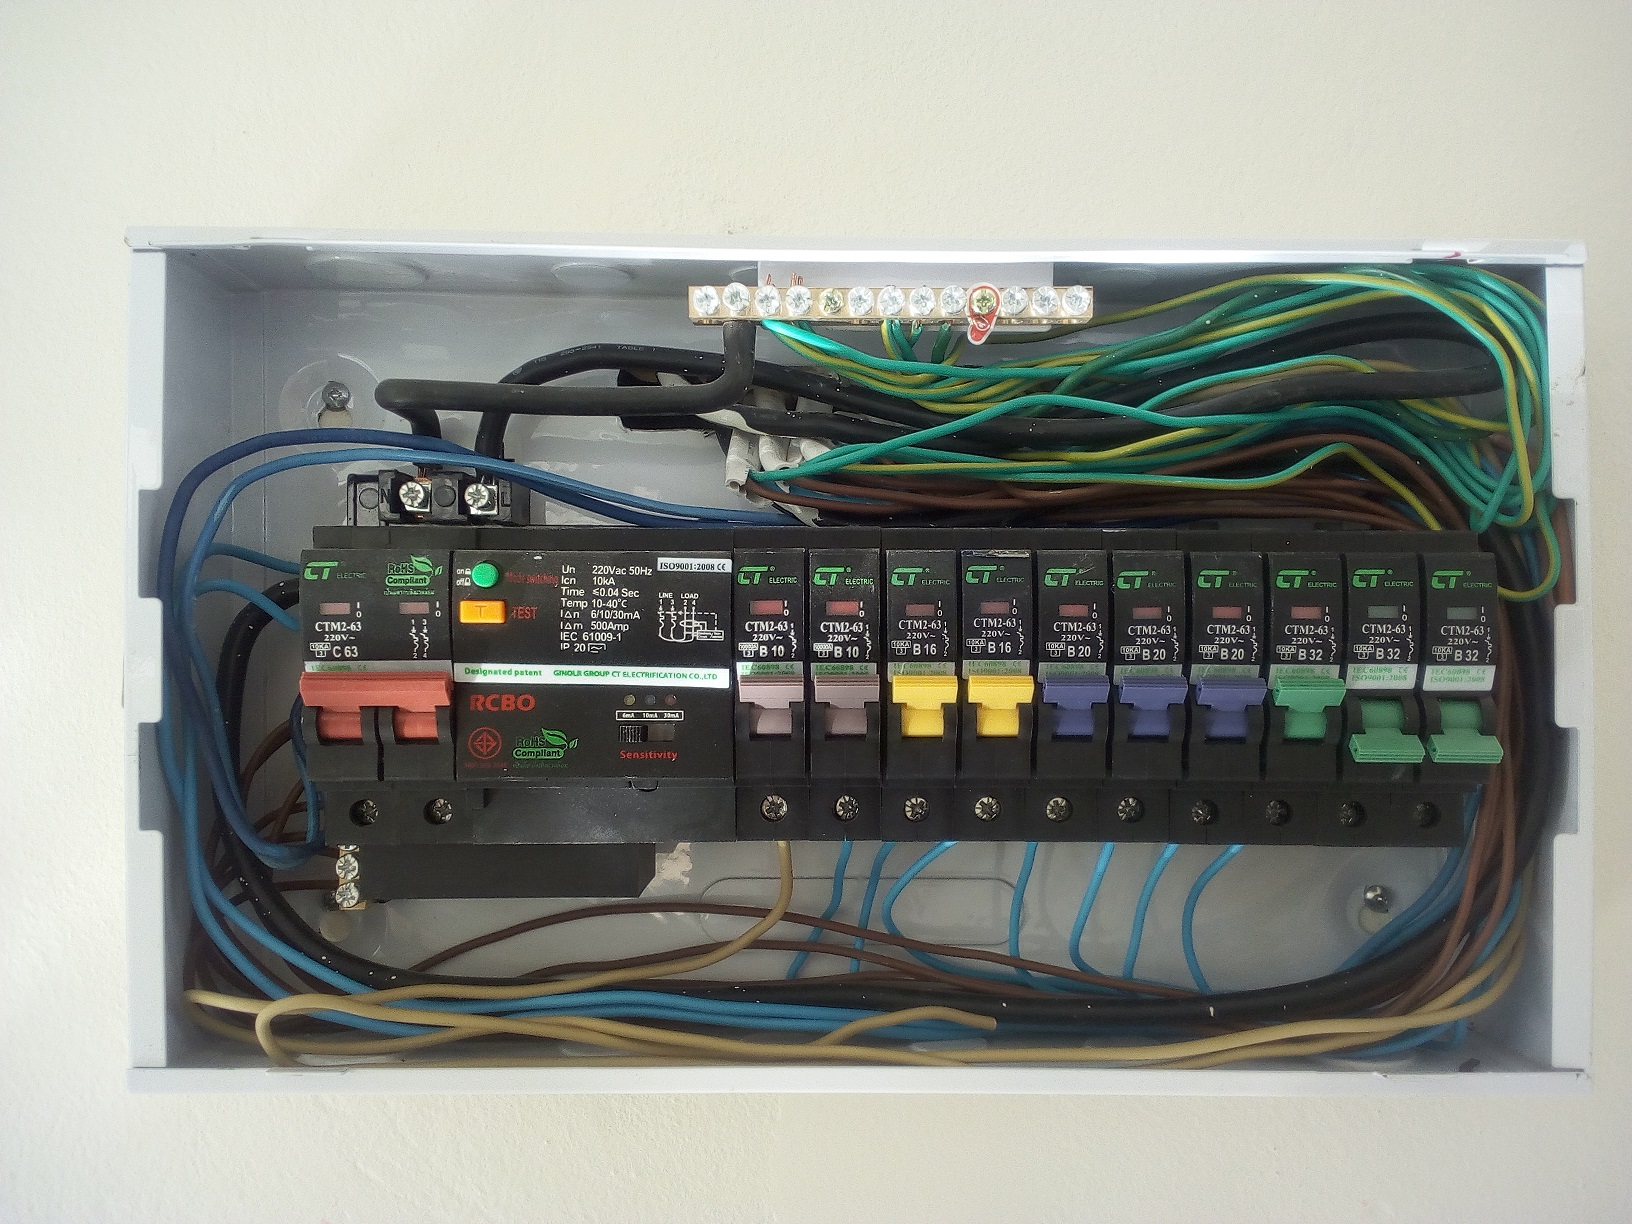 New House - Strange Breaker Box Wiring - The Electrical Forum ...